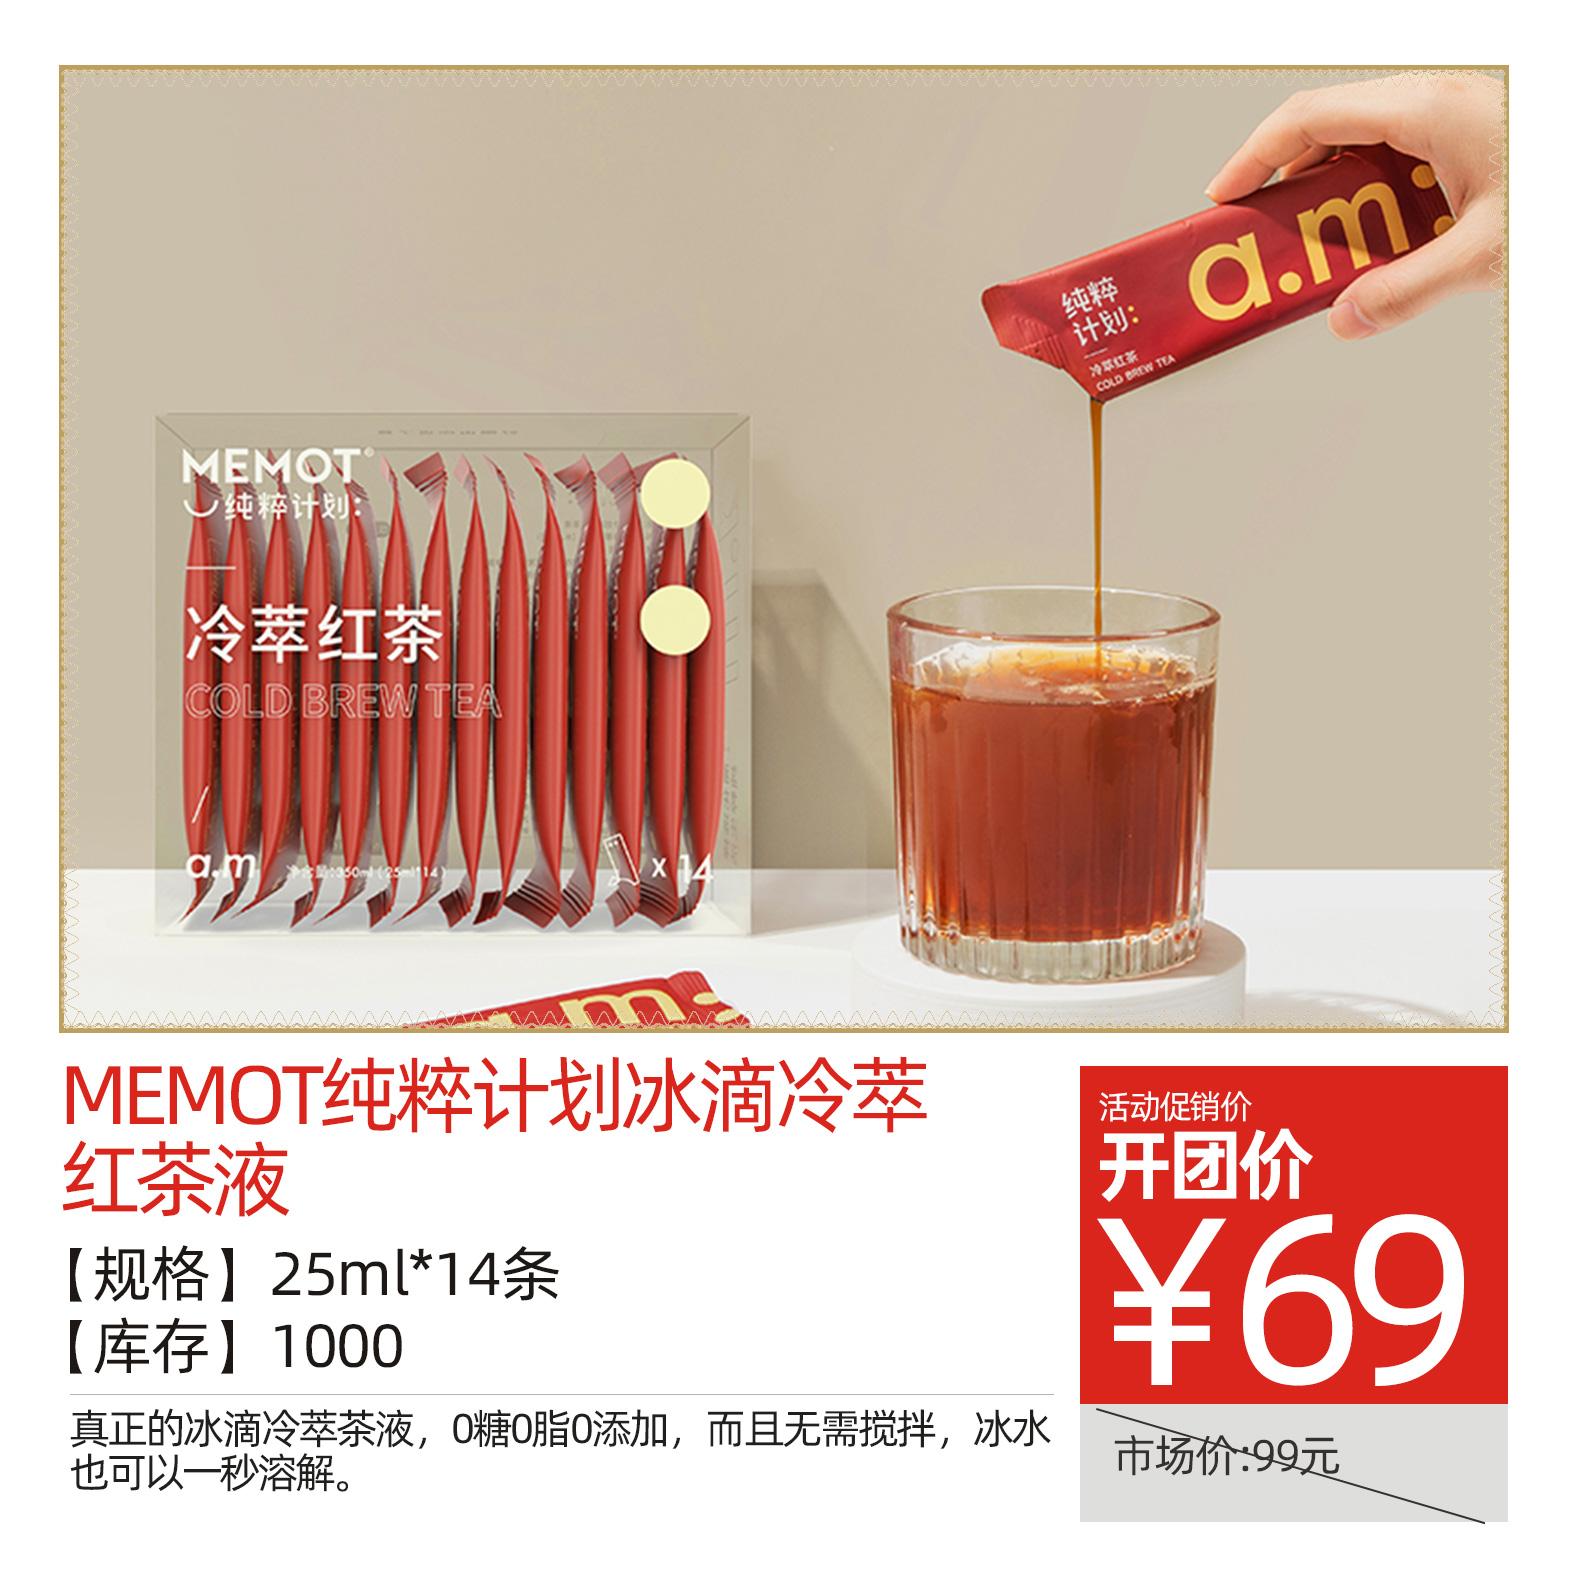 memot纯粹计划冰滴冷萃红茶液